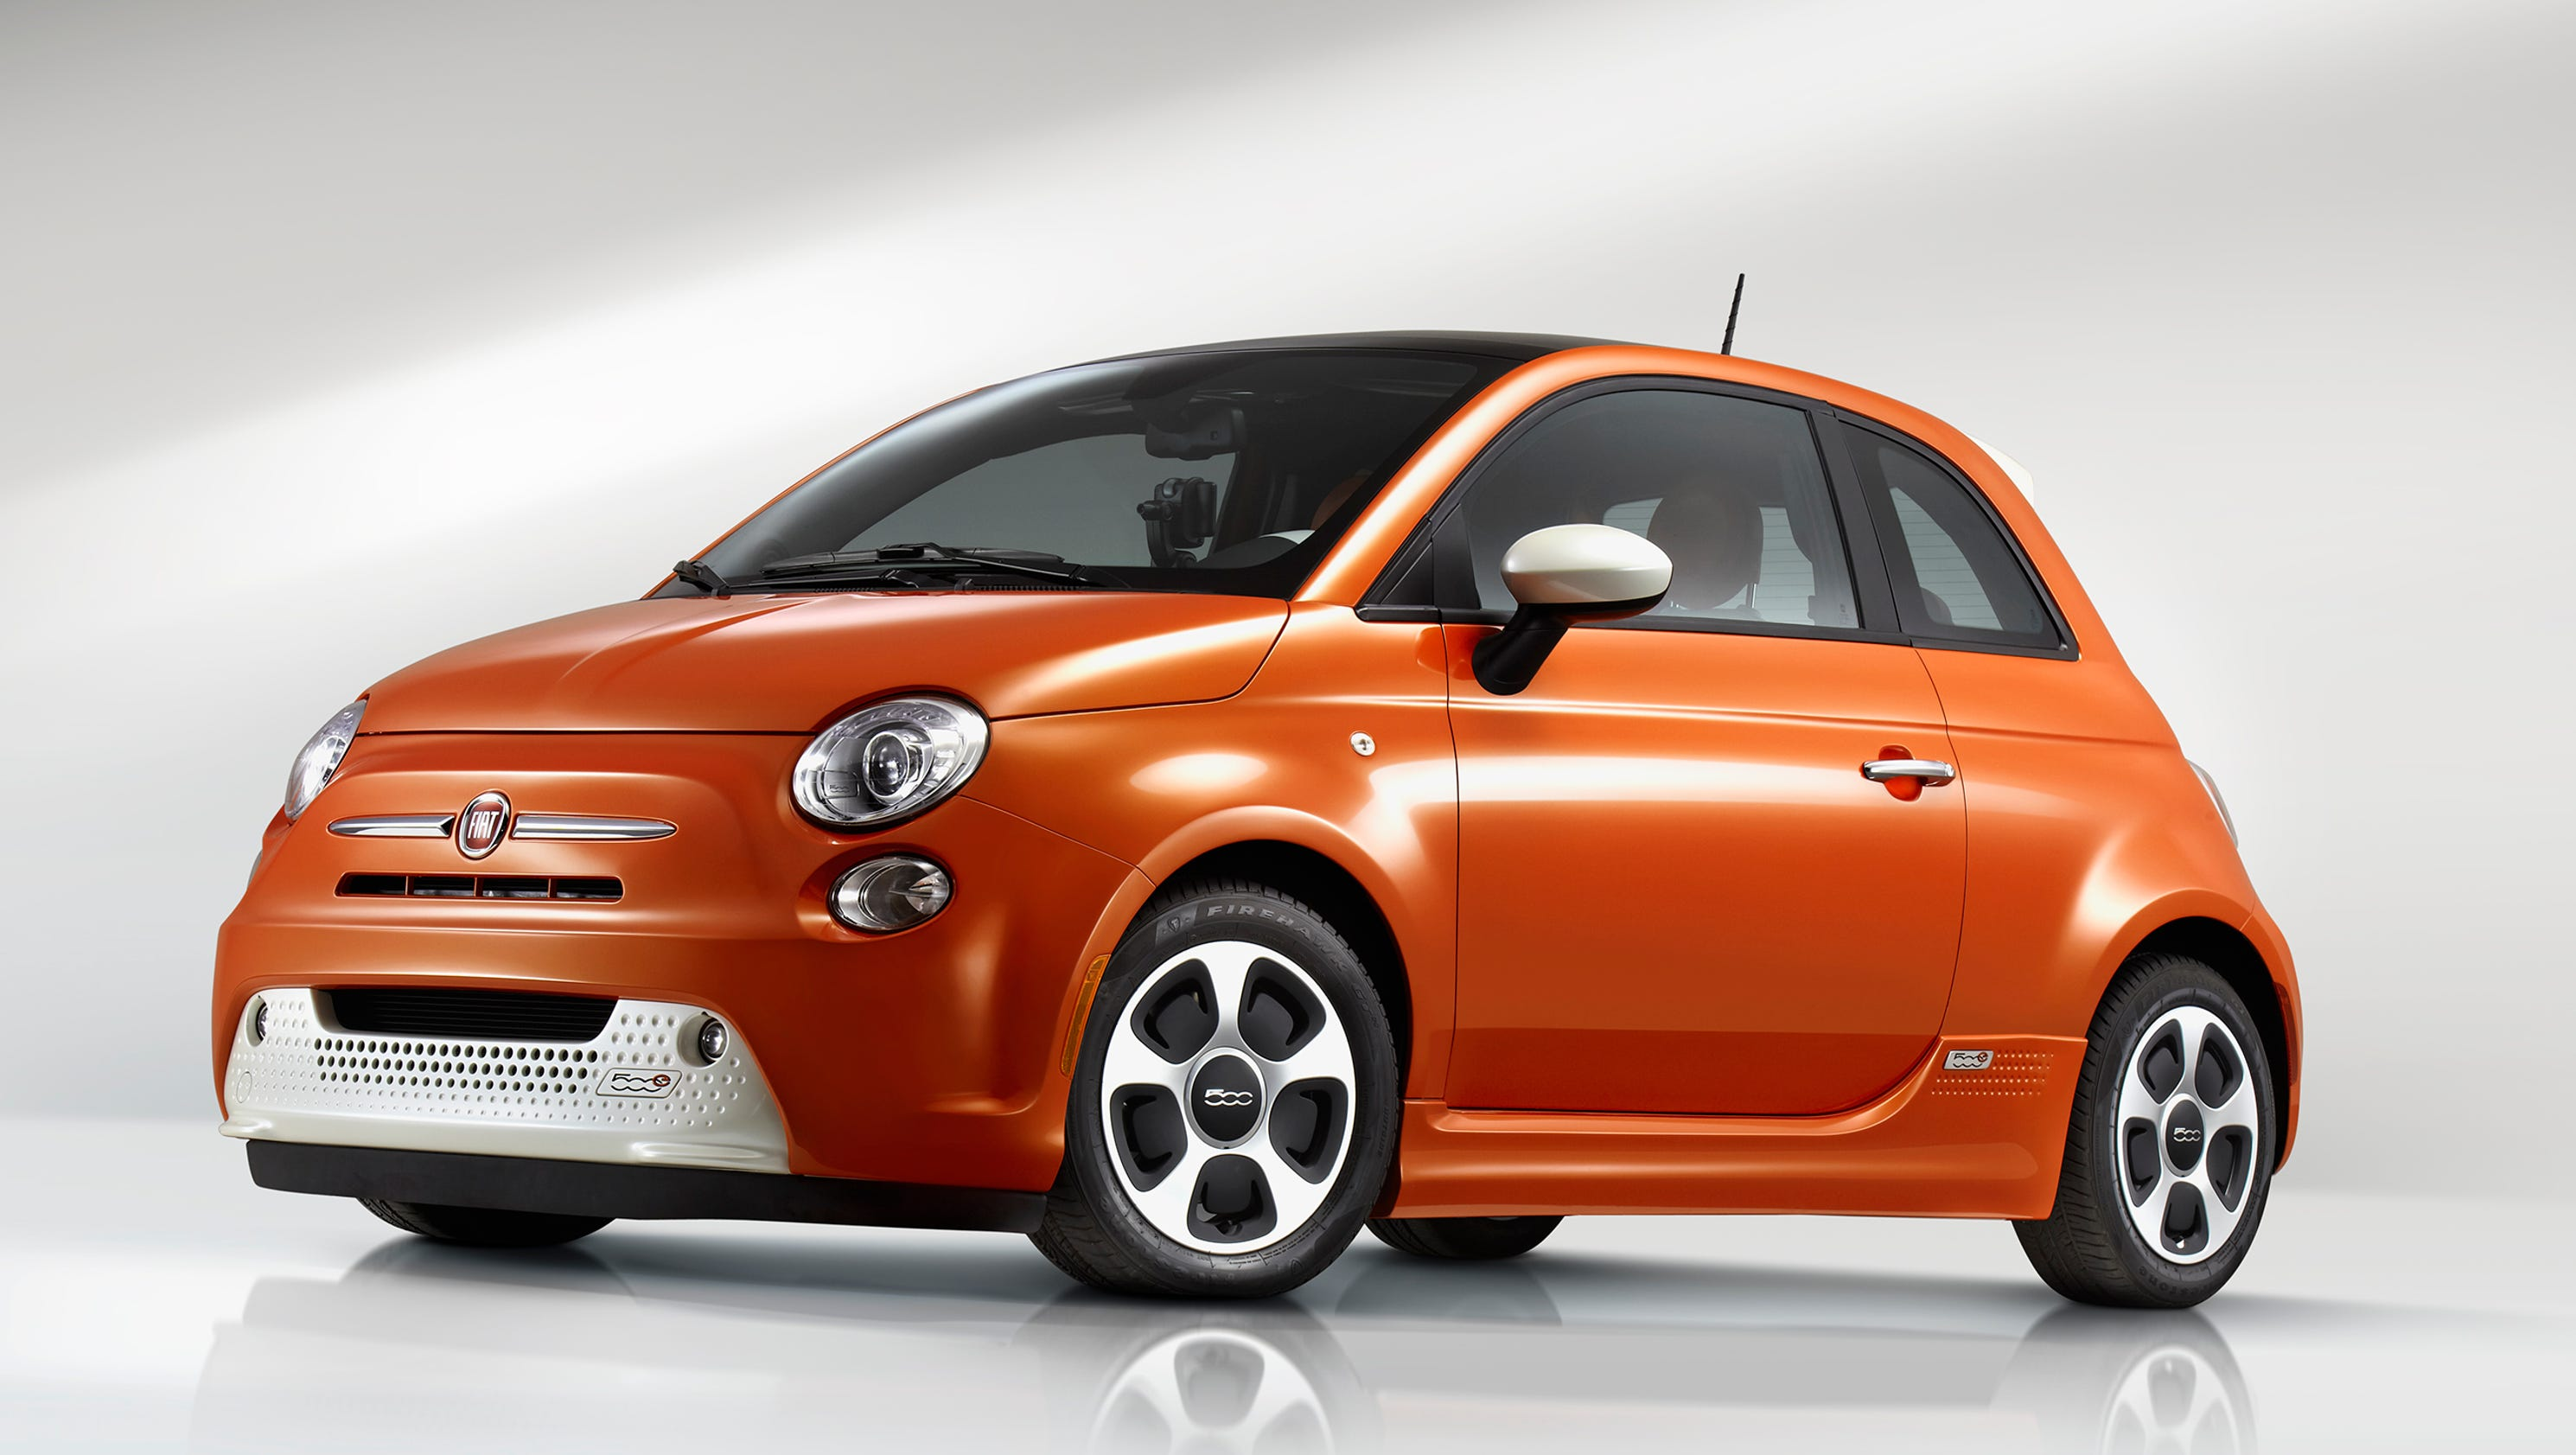 Fiat 500e money losing battery car now in Oregon